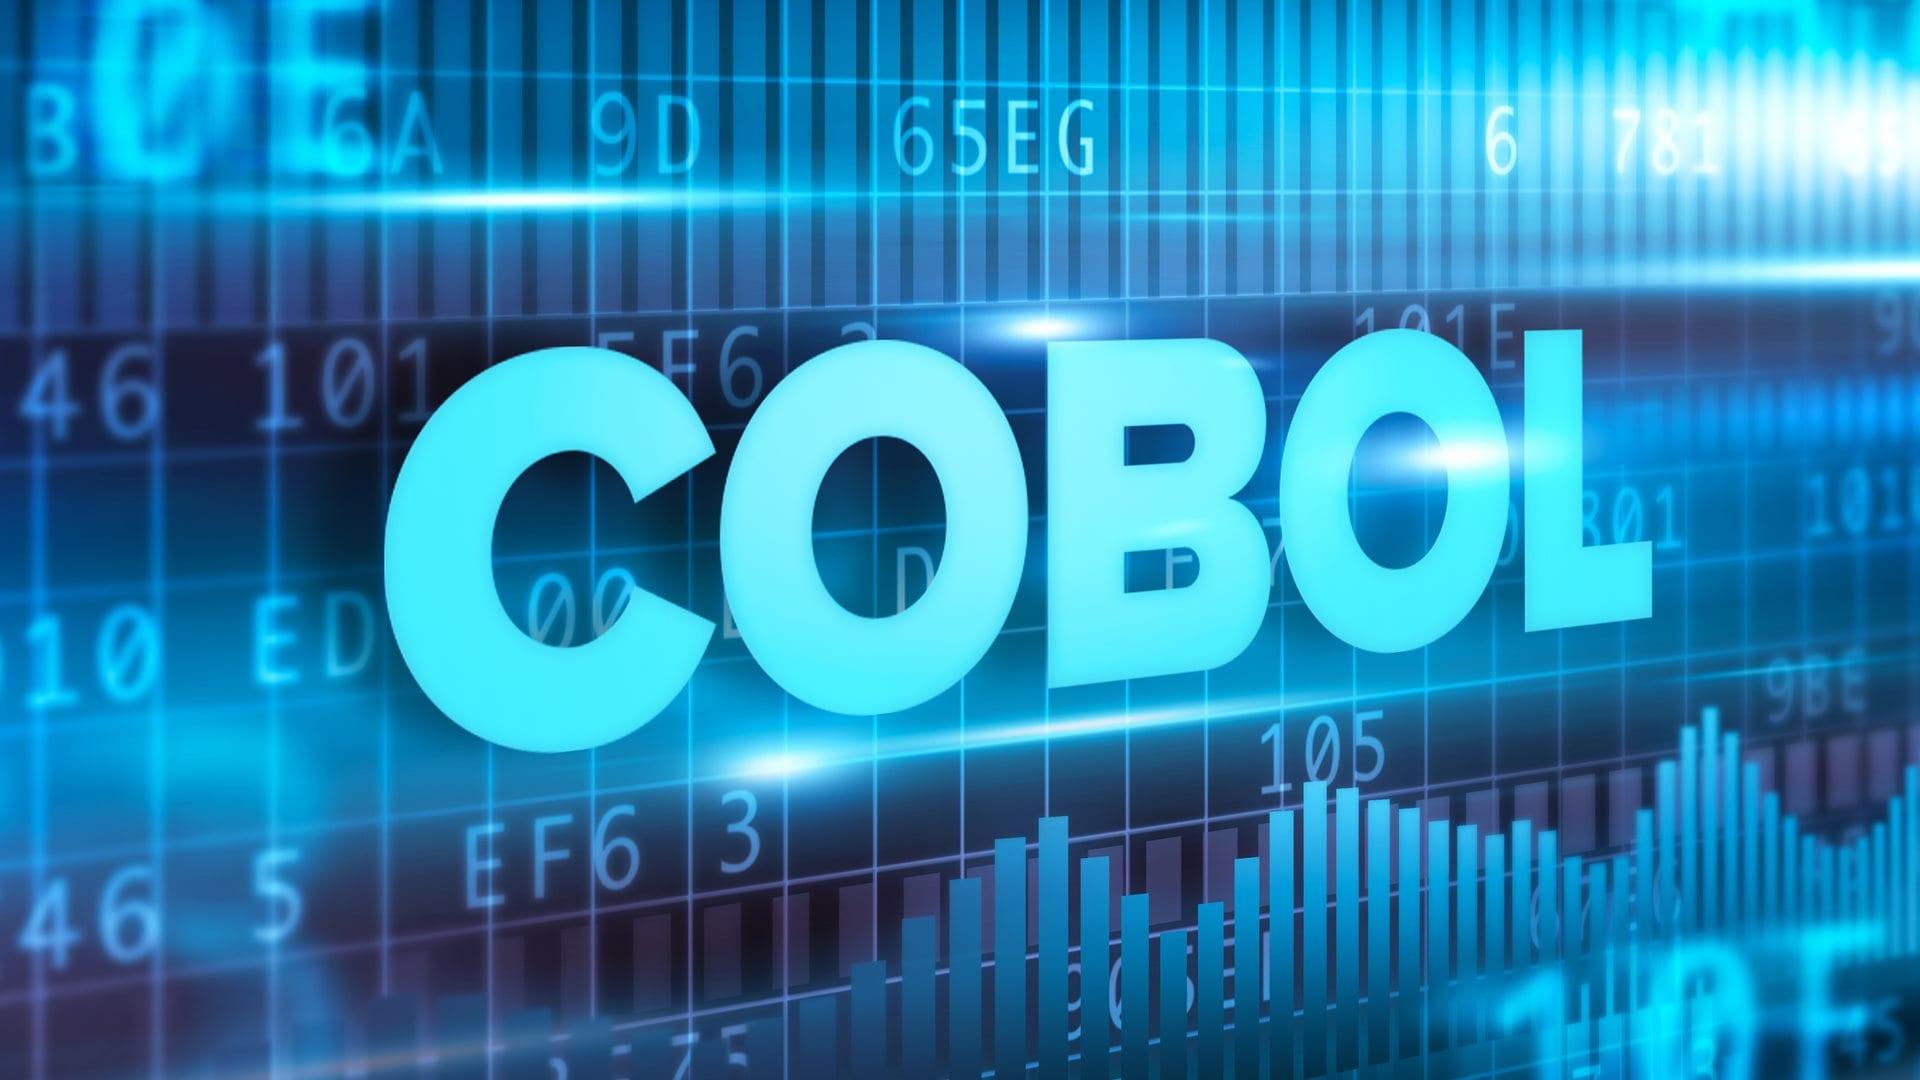 USA: improvvisamente torna di moda il COBOL